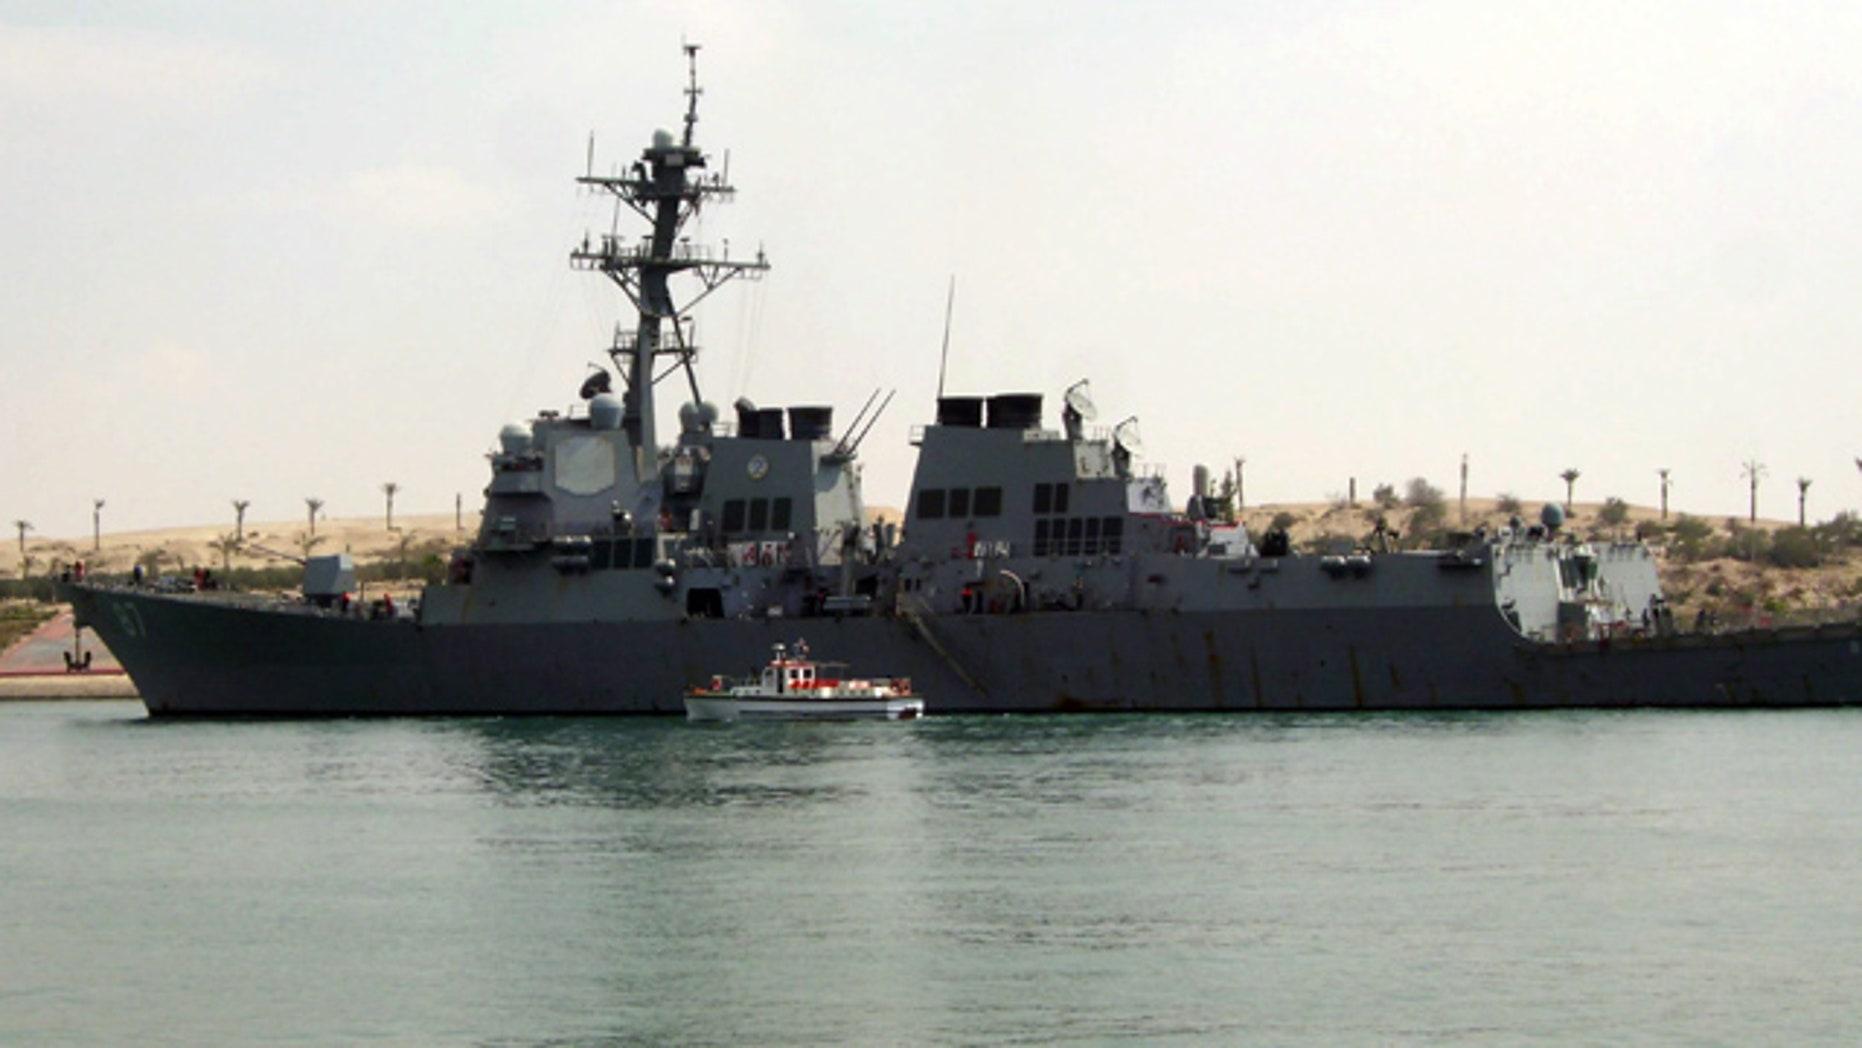 March 12: U.S. destroyer USS Mason sails in the Suez canal in Ismailia, Egypt.